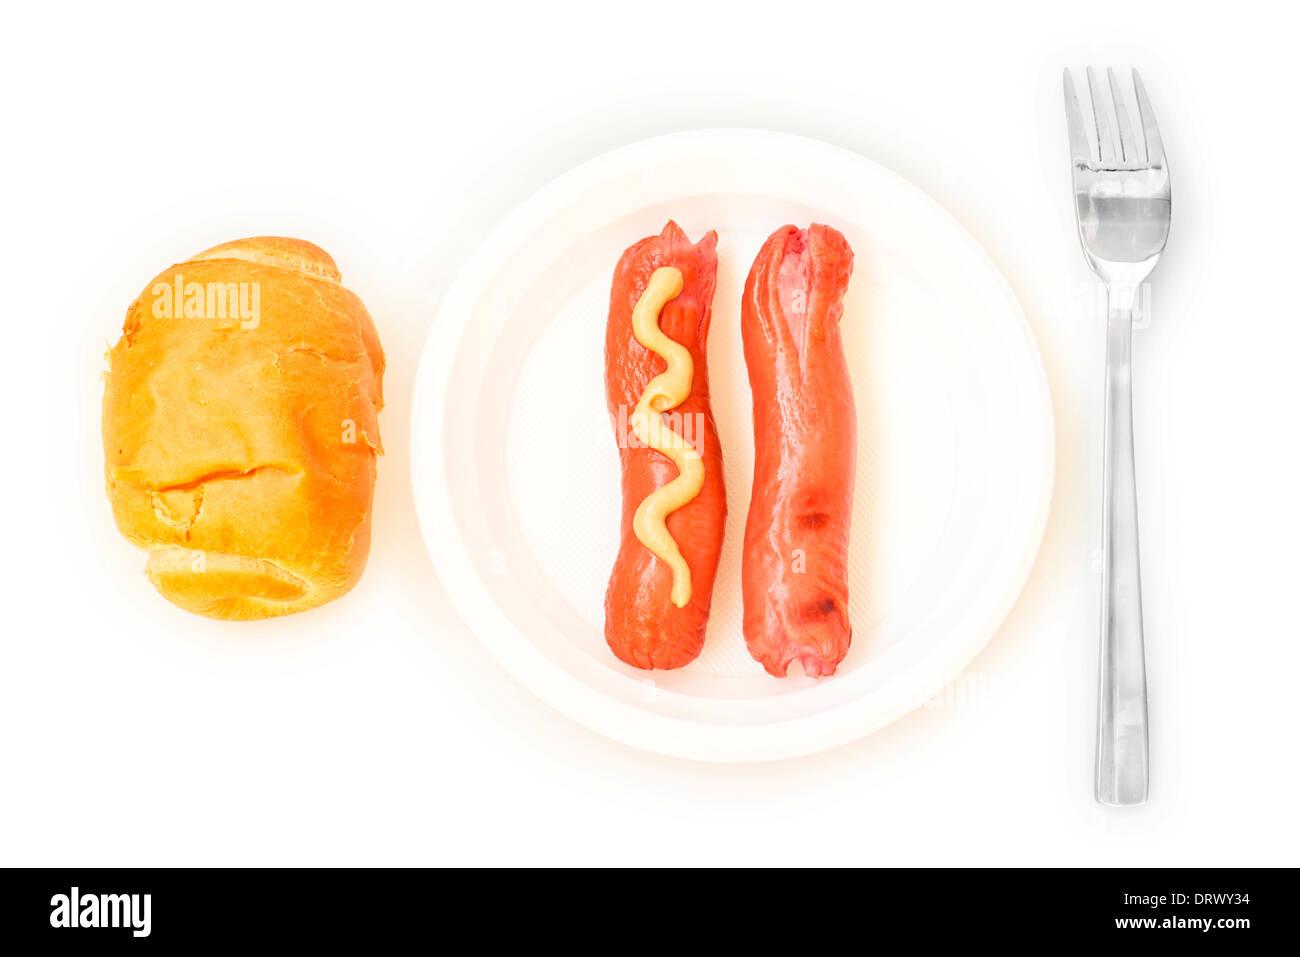 fast food - Stock Image